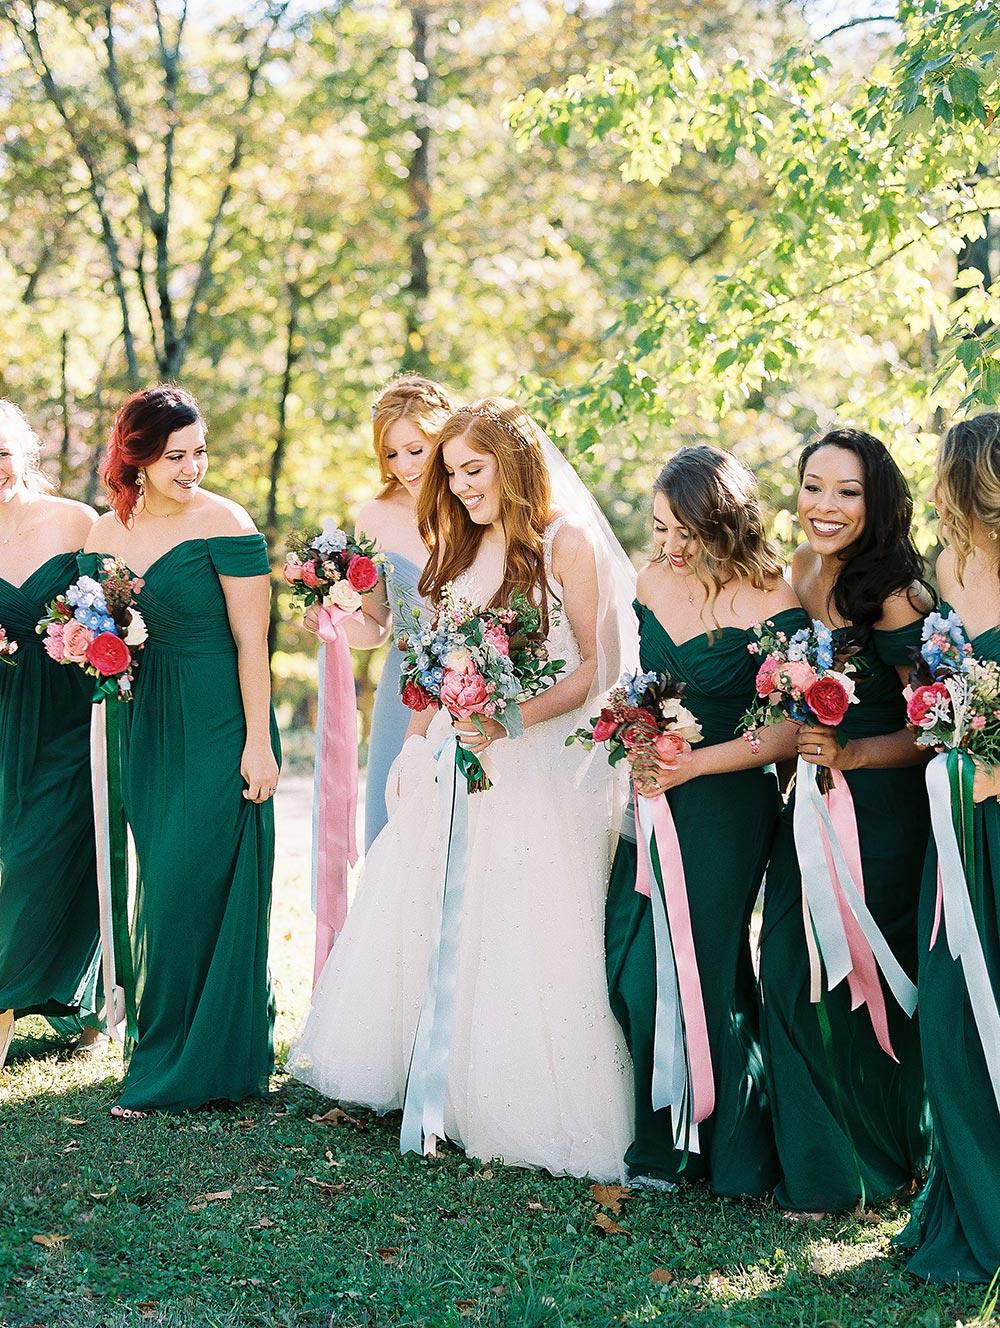 This Enchanting Spring Wedding is a Real Life Fairytale  #whimsicalweddingflowers #modernfairytale #cinderellainspiredwedding